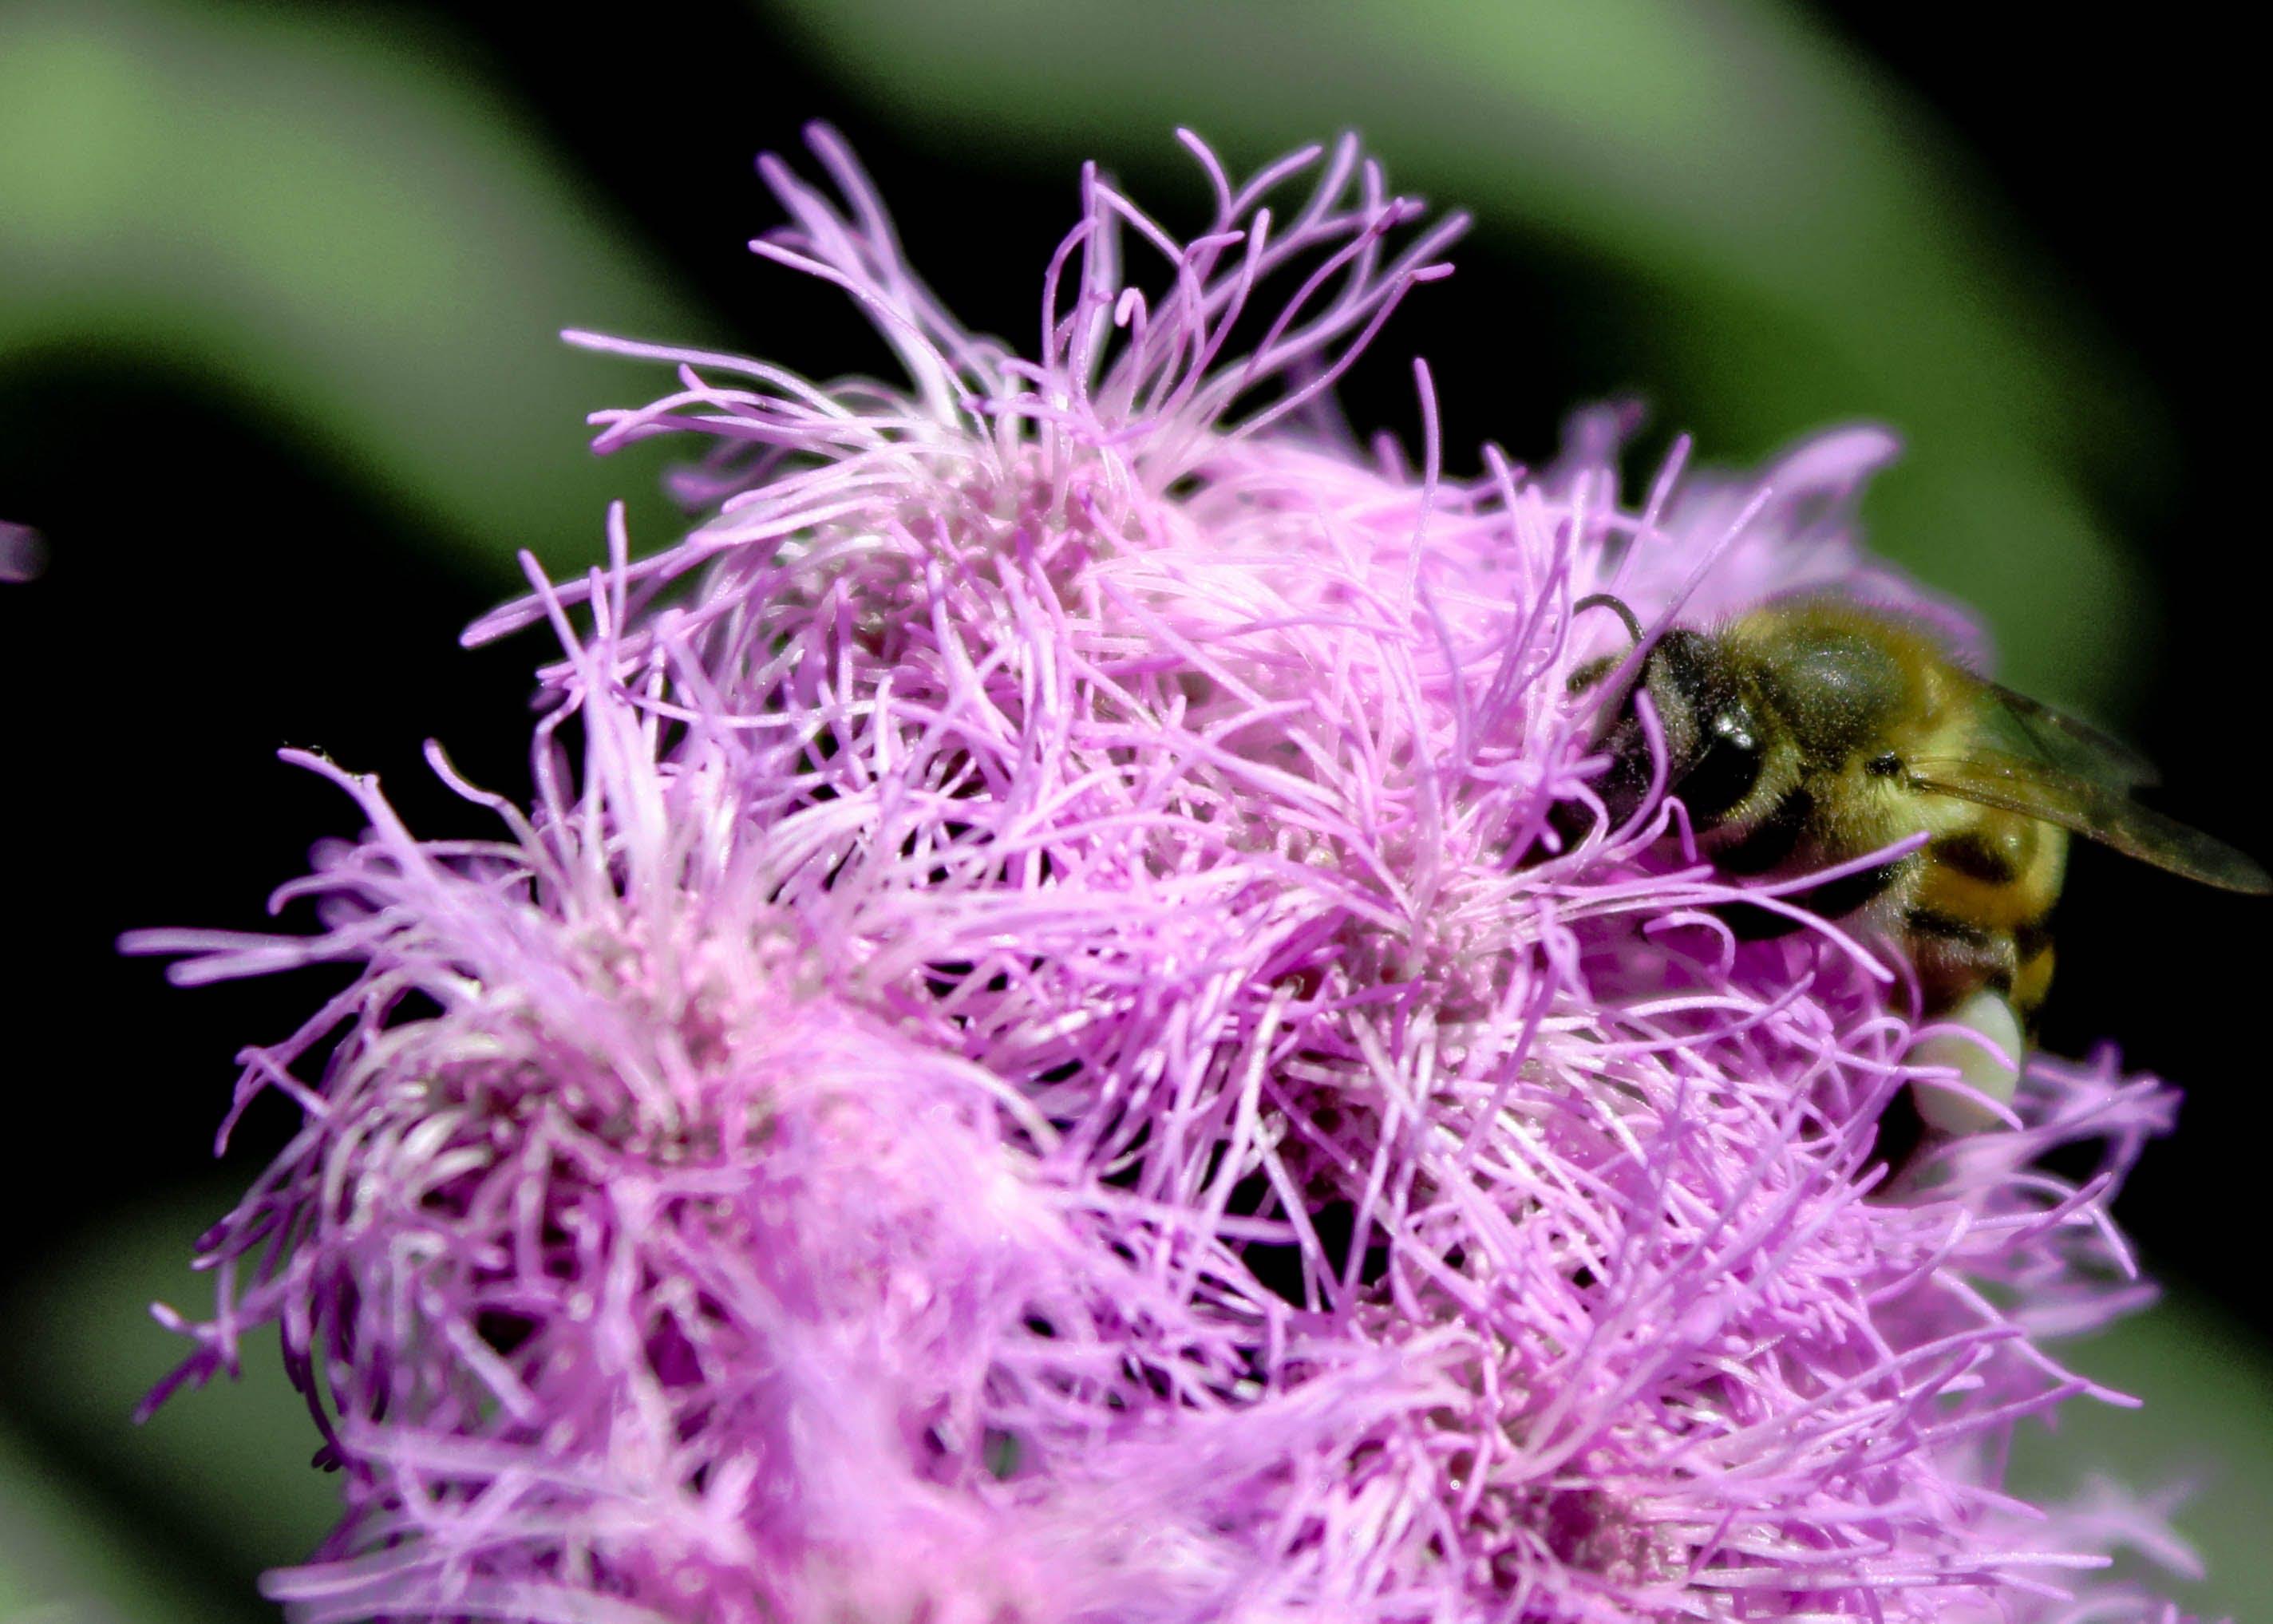 Kostenloses Stock Foto zu biene, botanischer garten, flügel, honigbiene